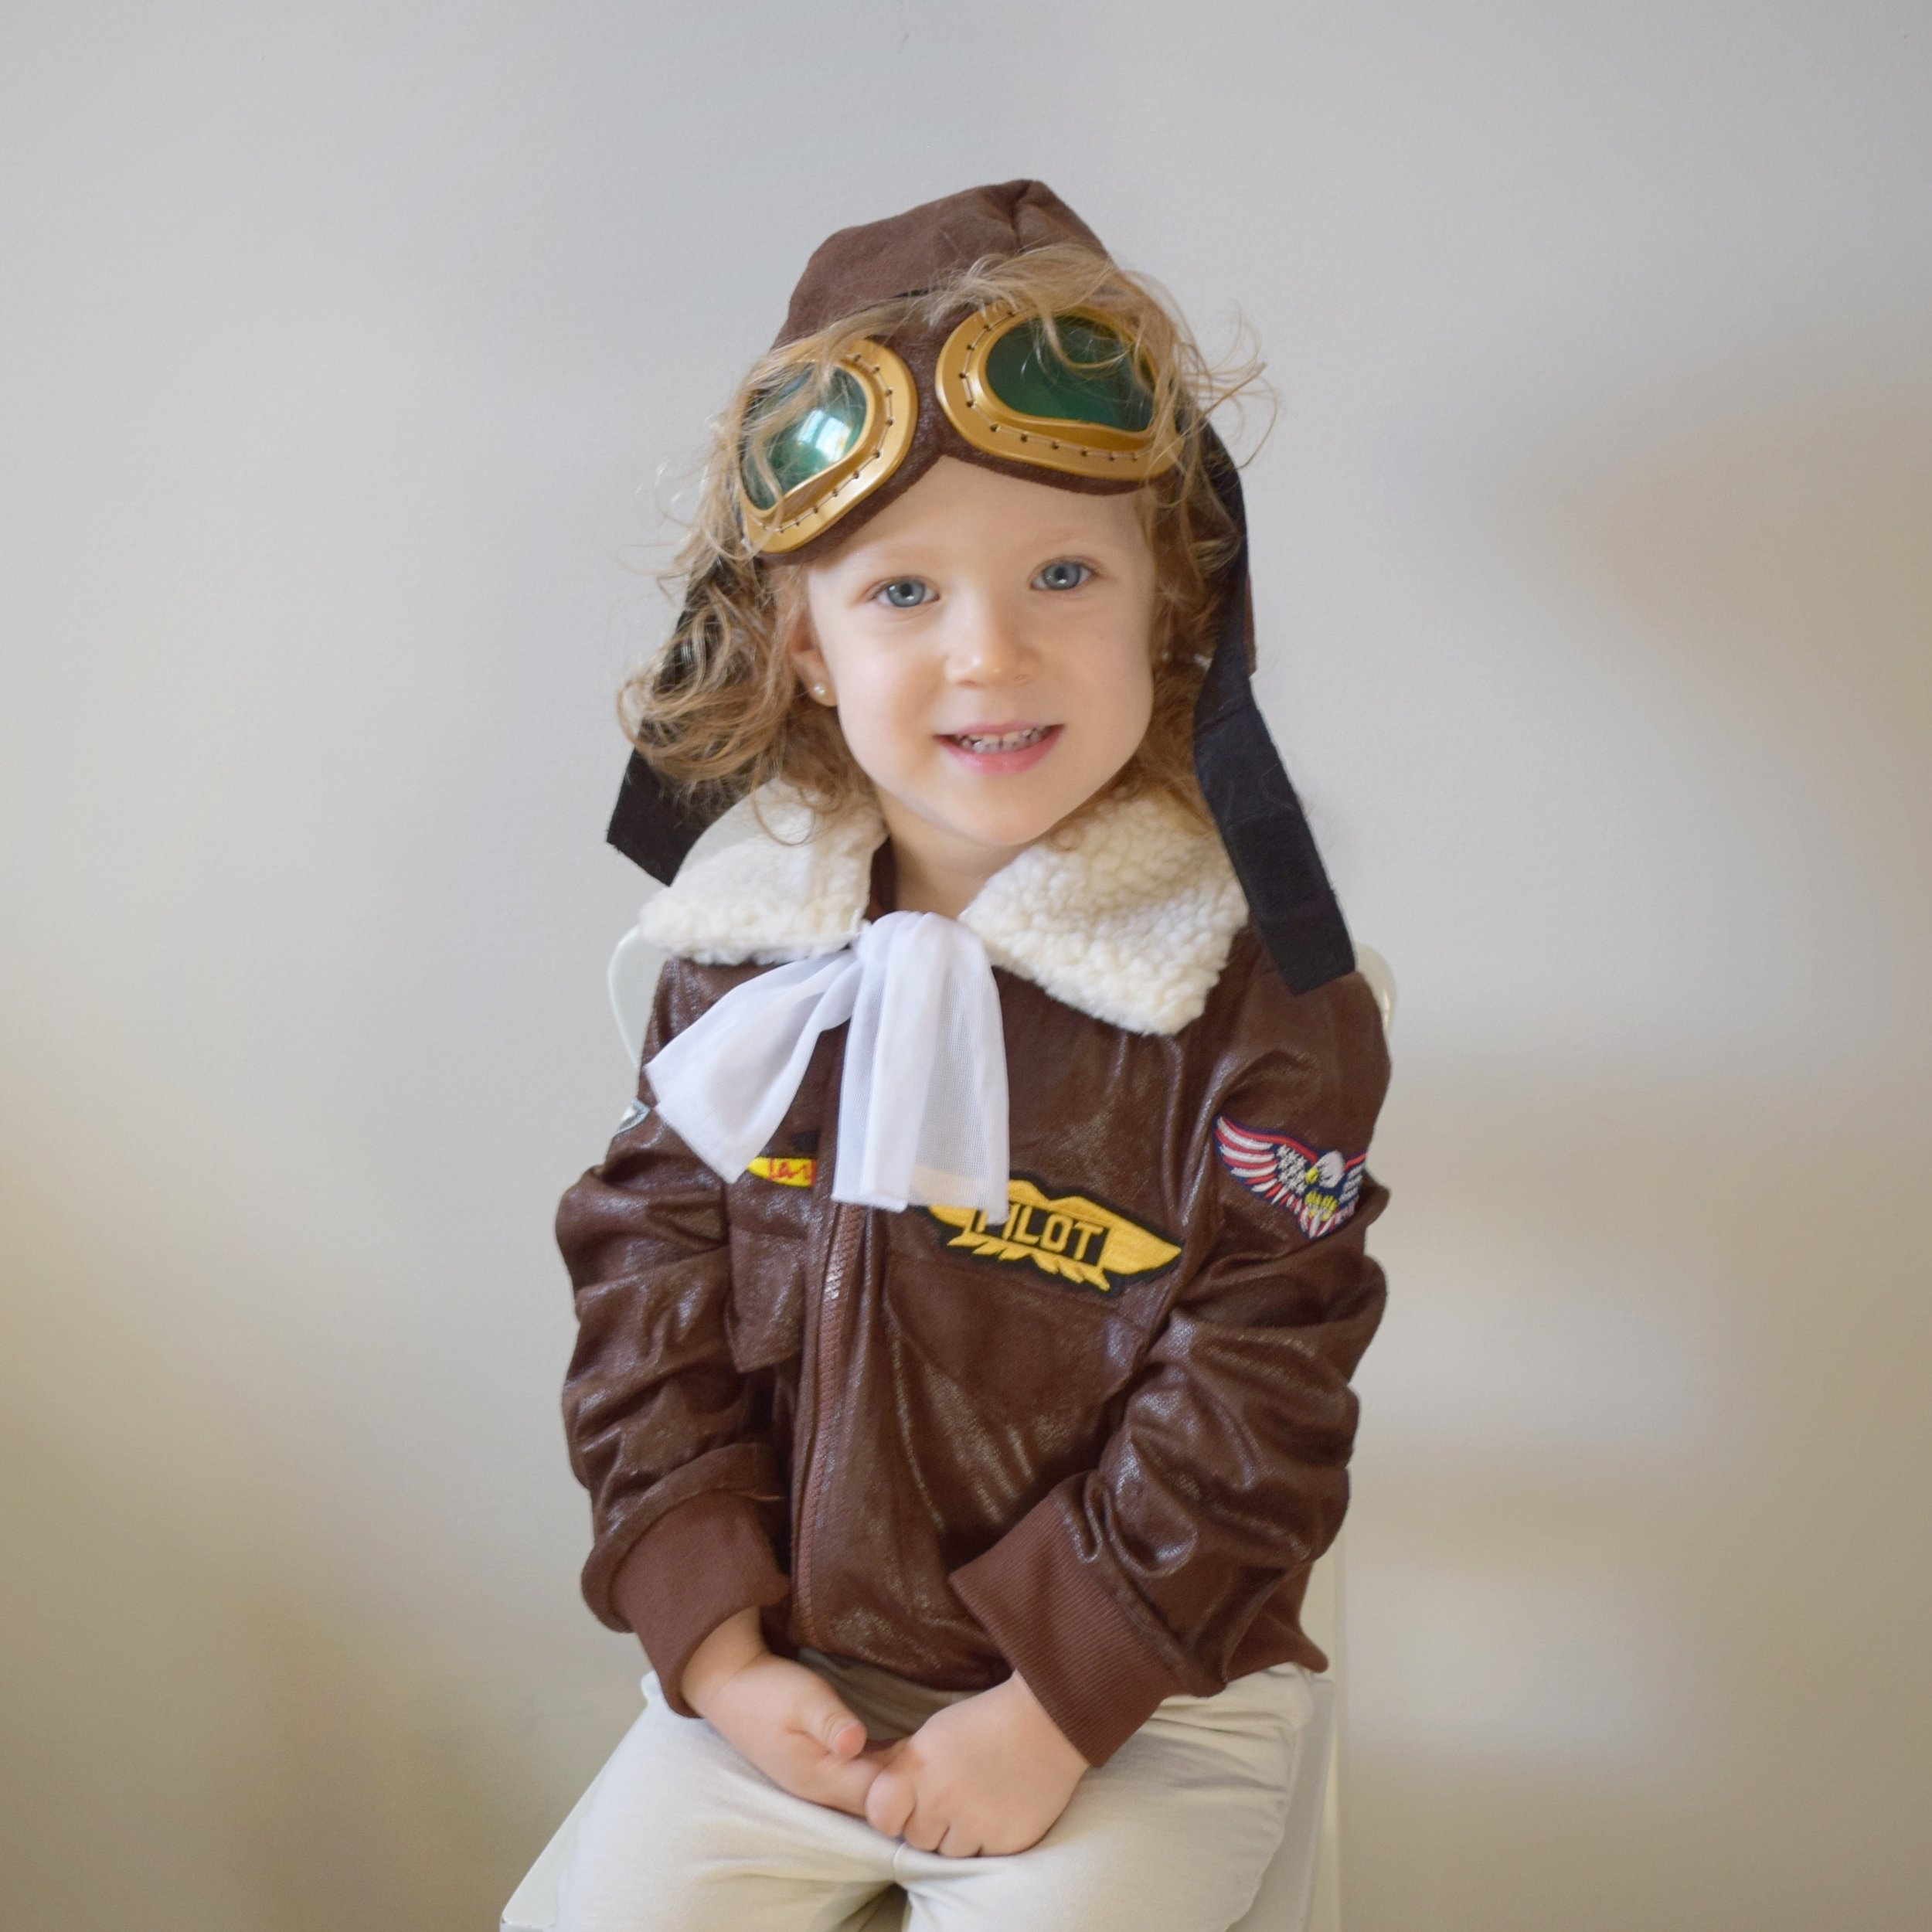 Amelia Earhart Costume For Kids - Best